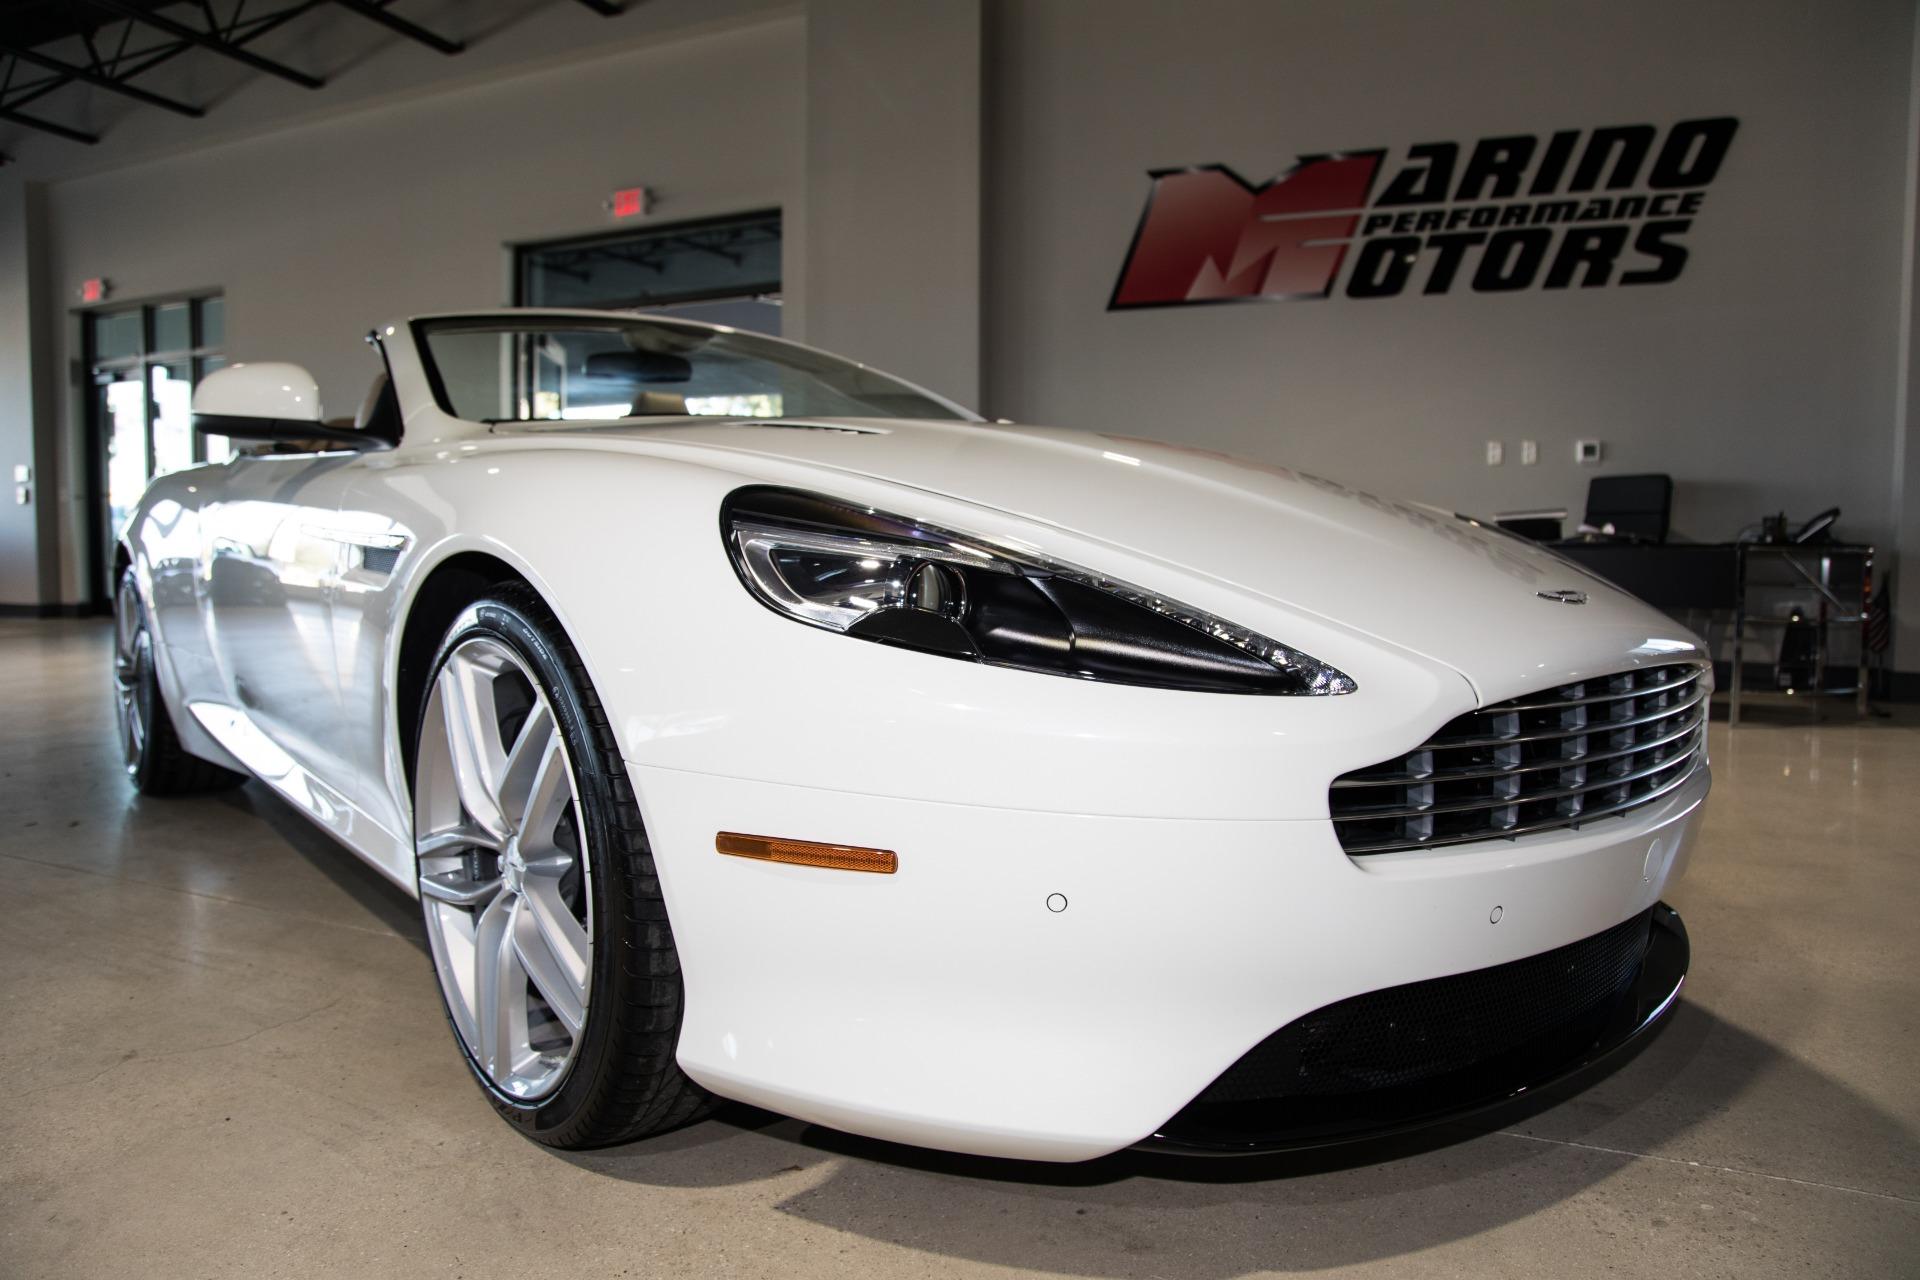 Aston Martin Used >> Used 2016 Aston Martin Db9 Gt Volante For Sale 129 900